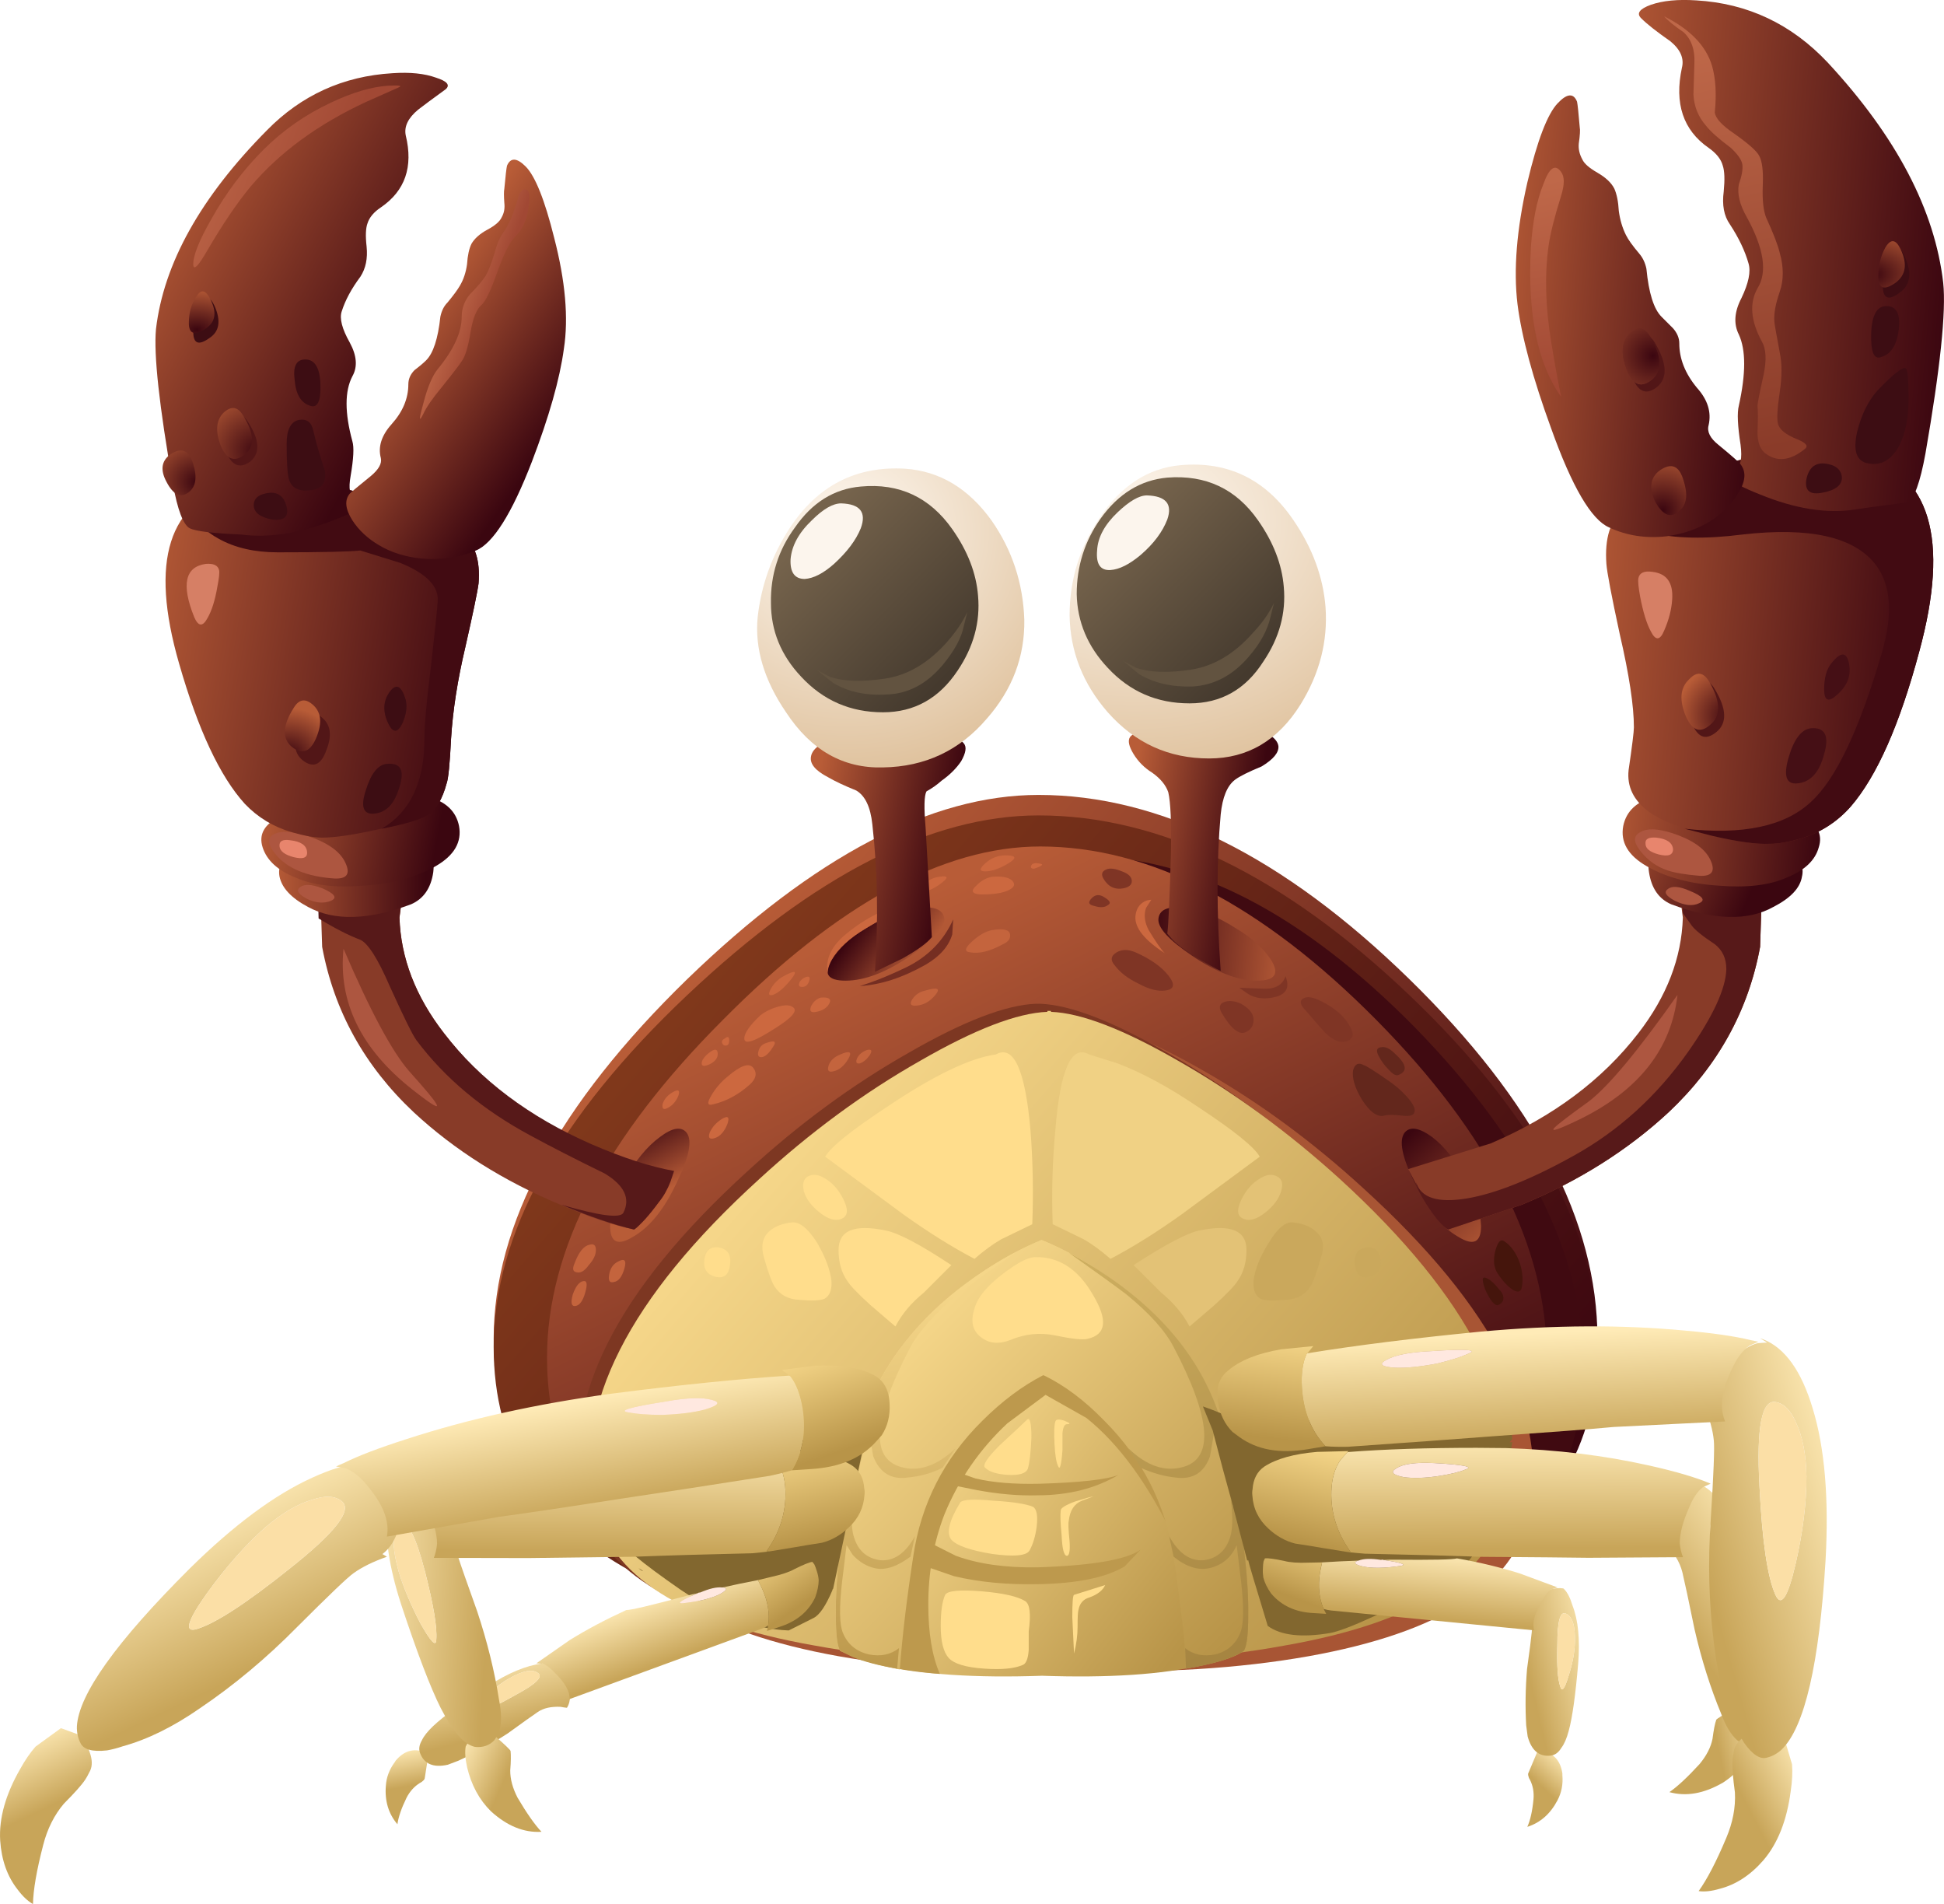 Pirate clipart crab. Bclipart inhabitants npc crabbclipart